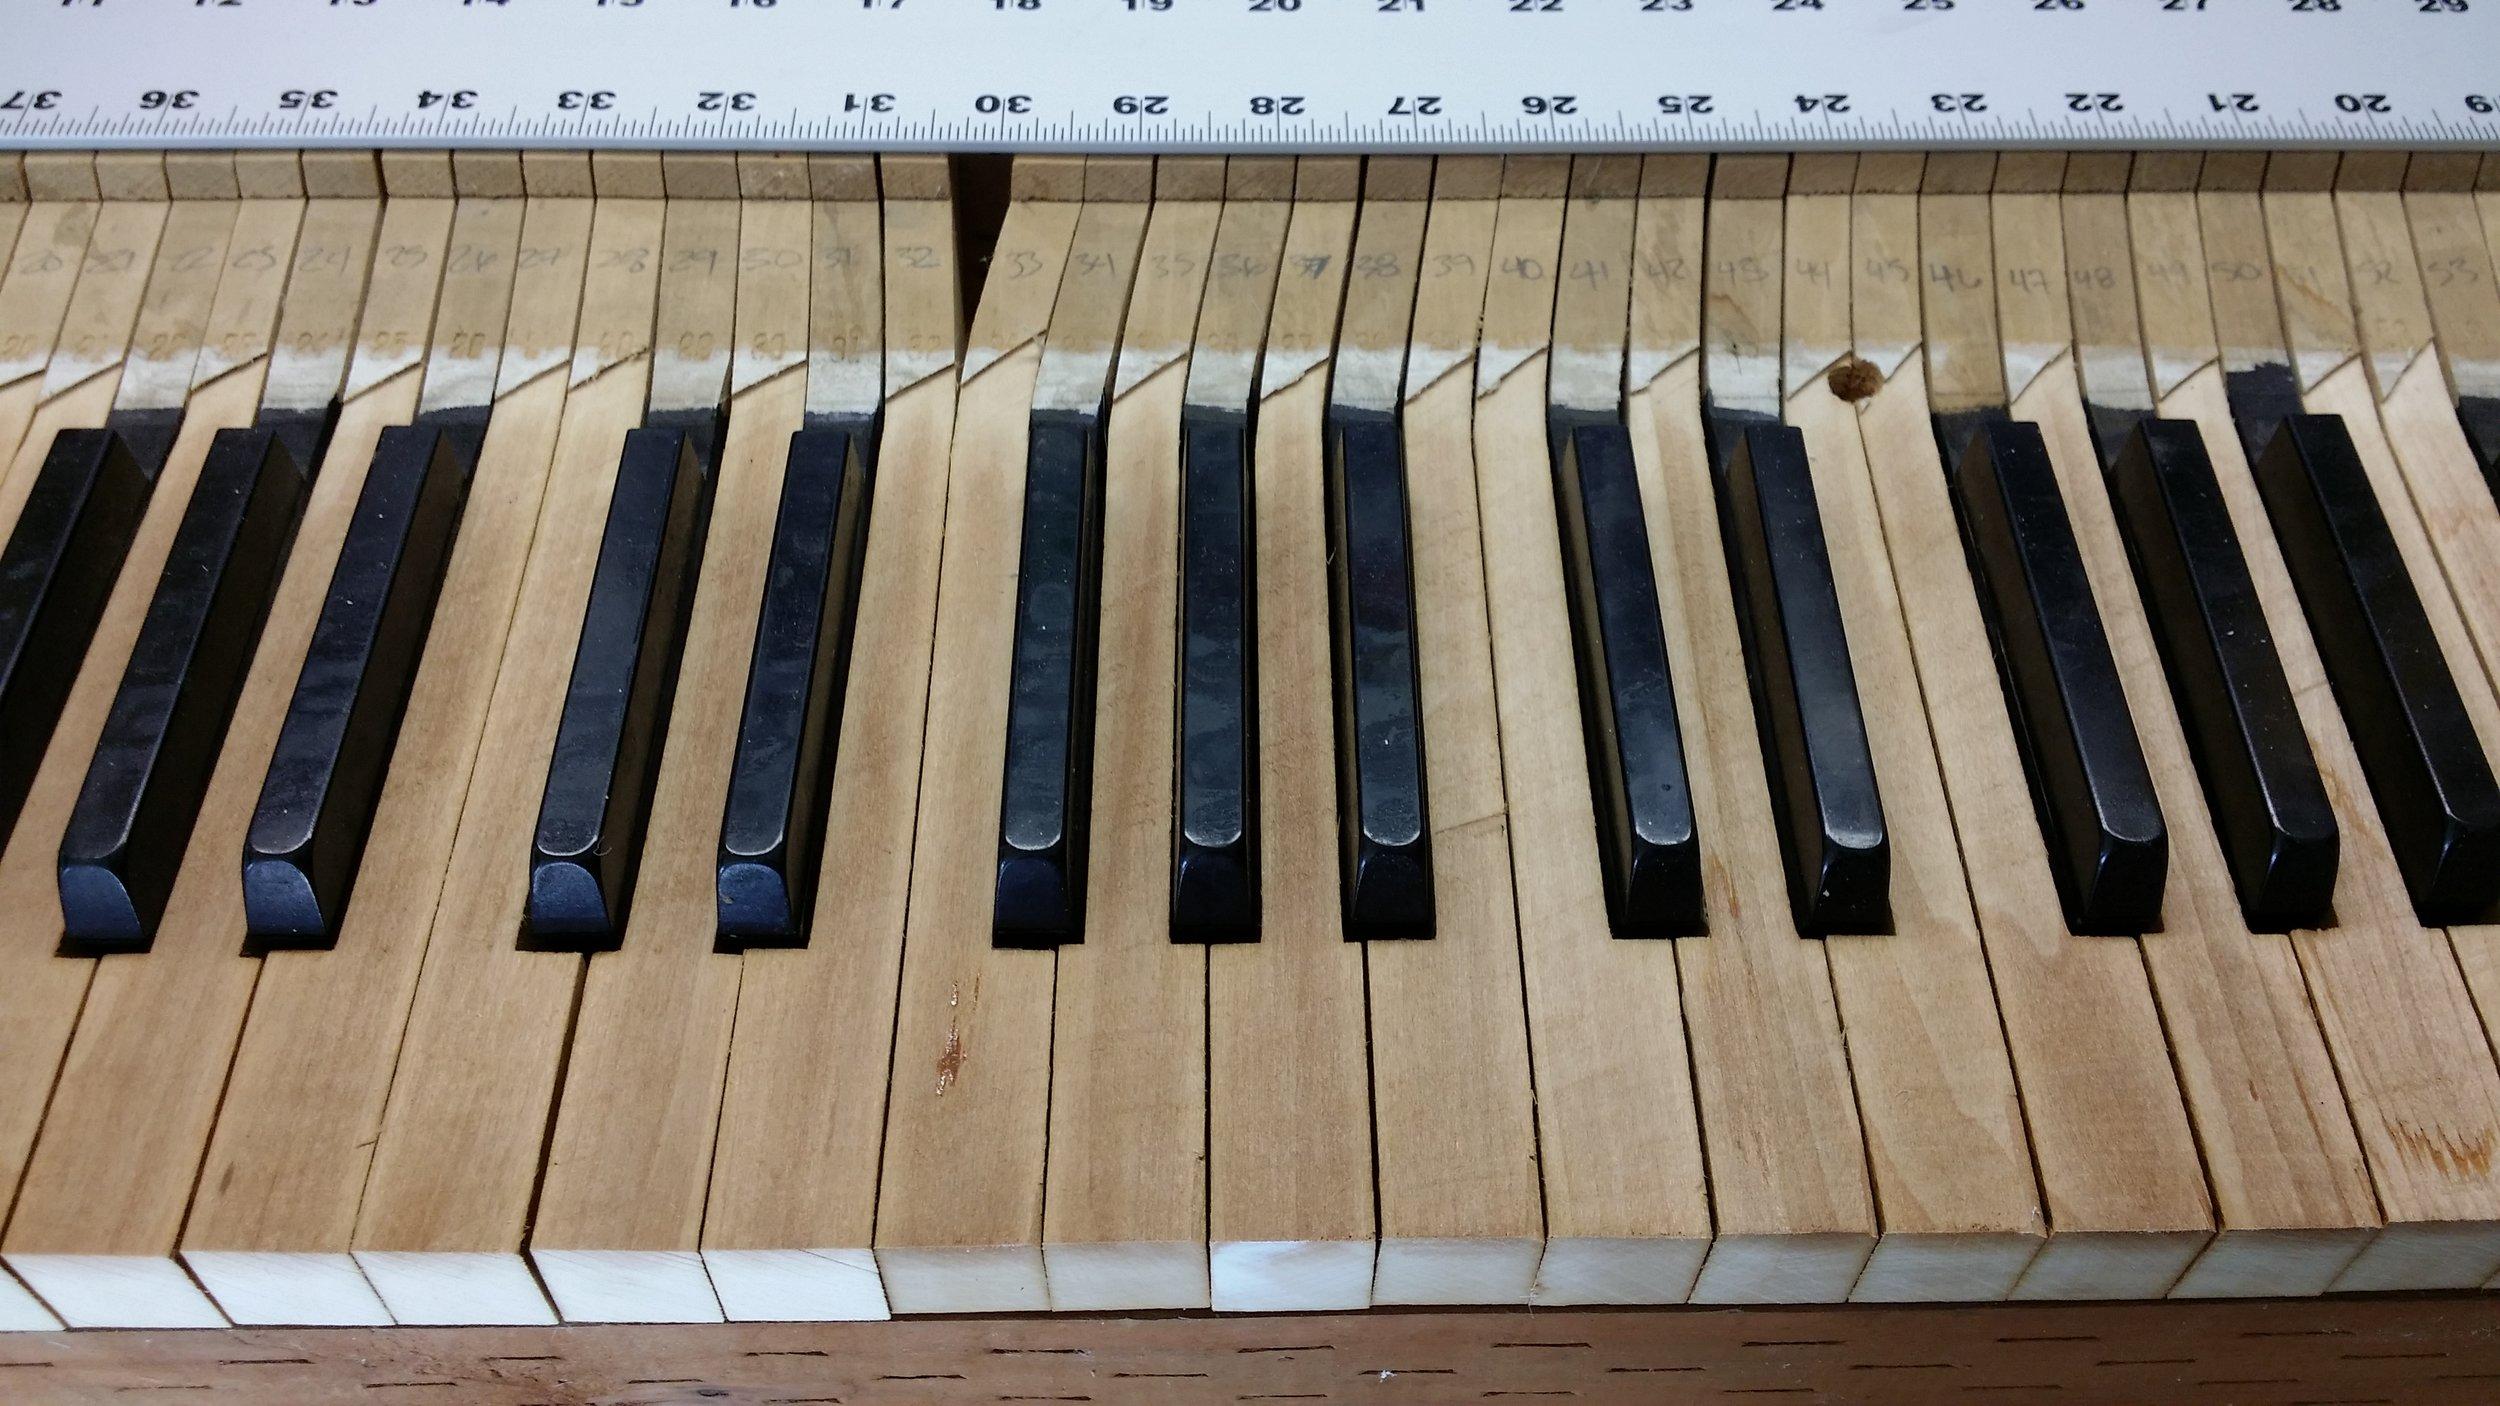 Milled Piano Keys